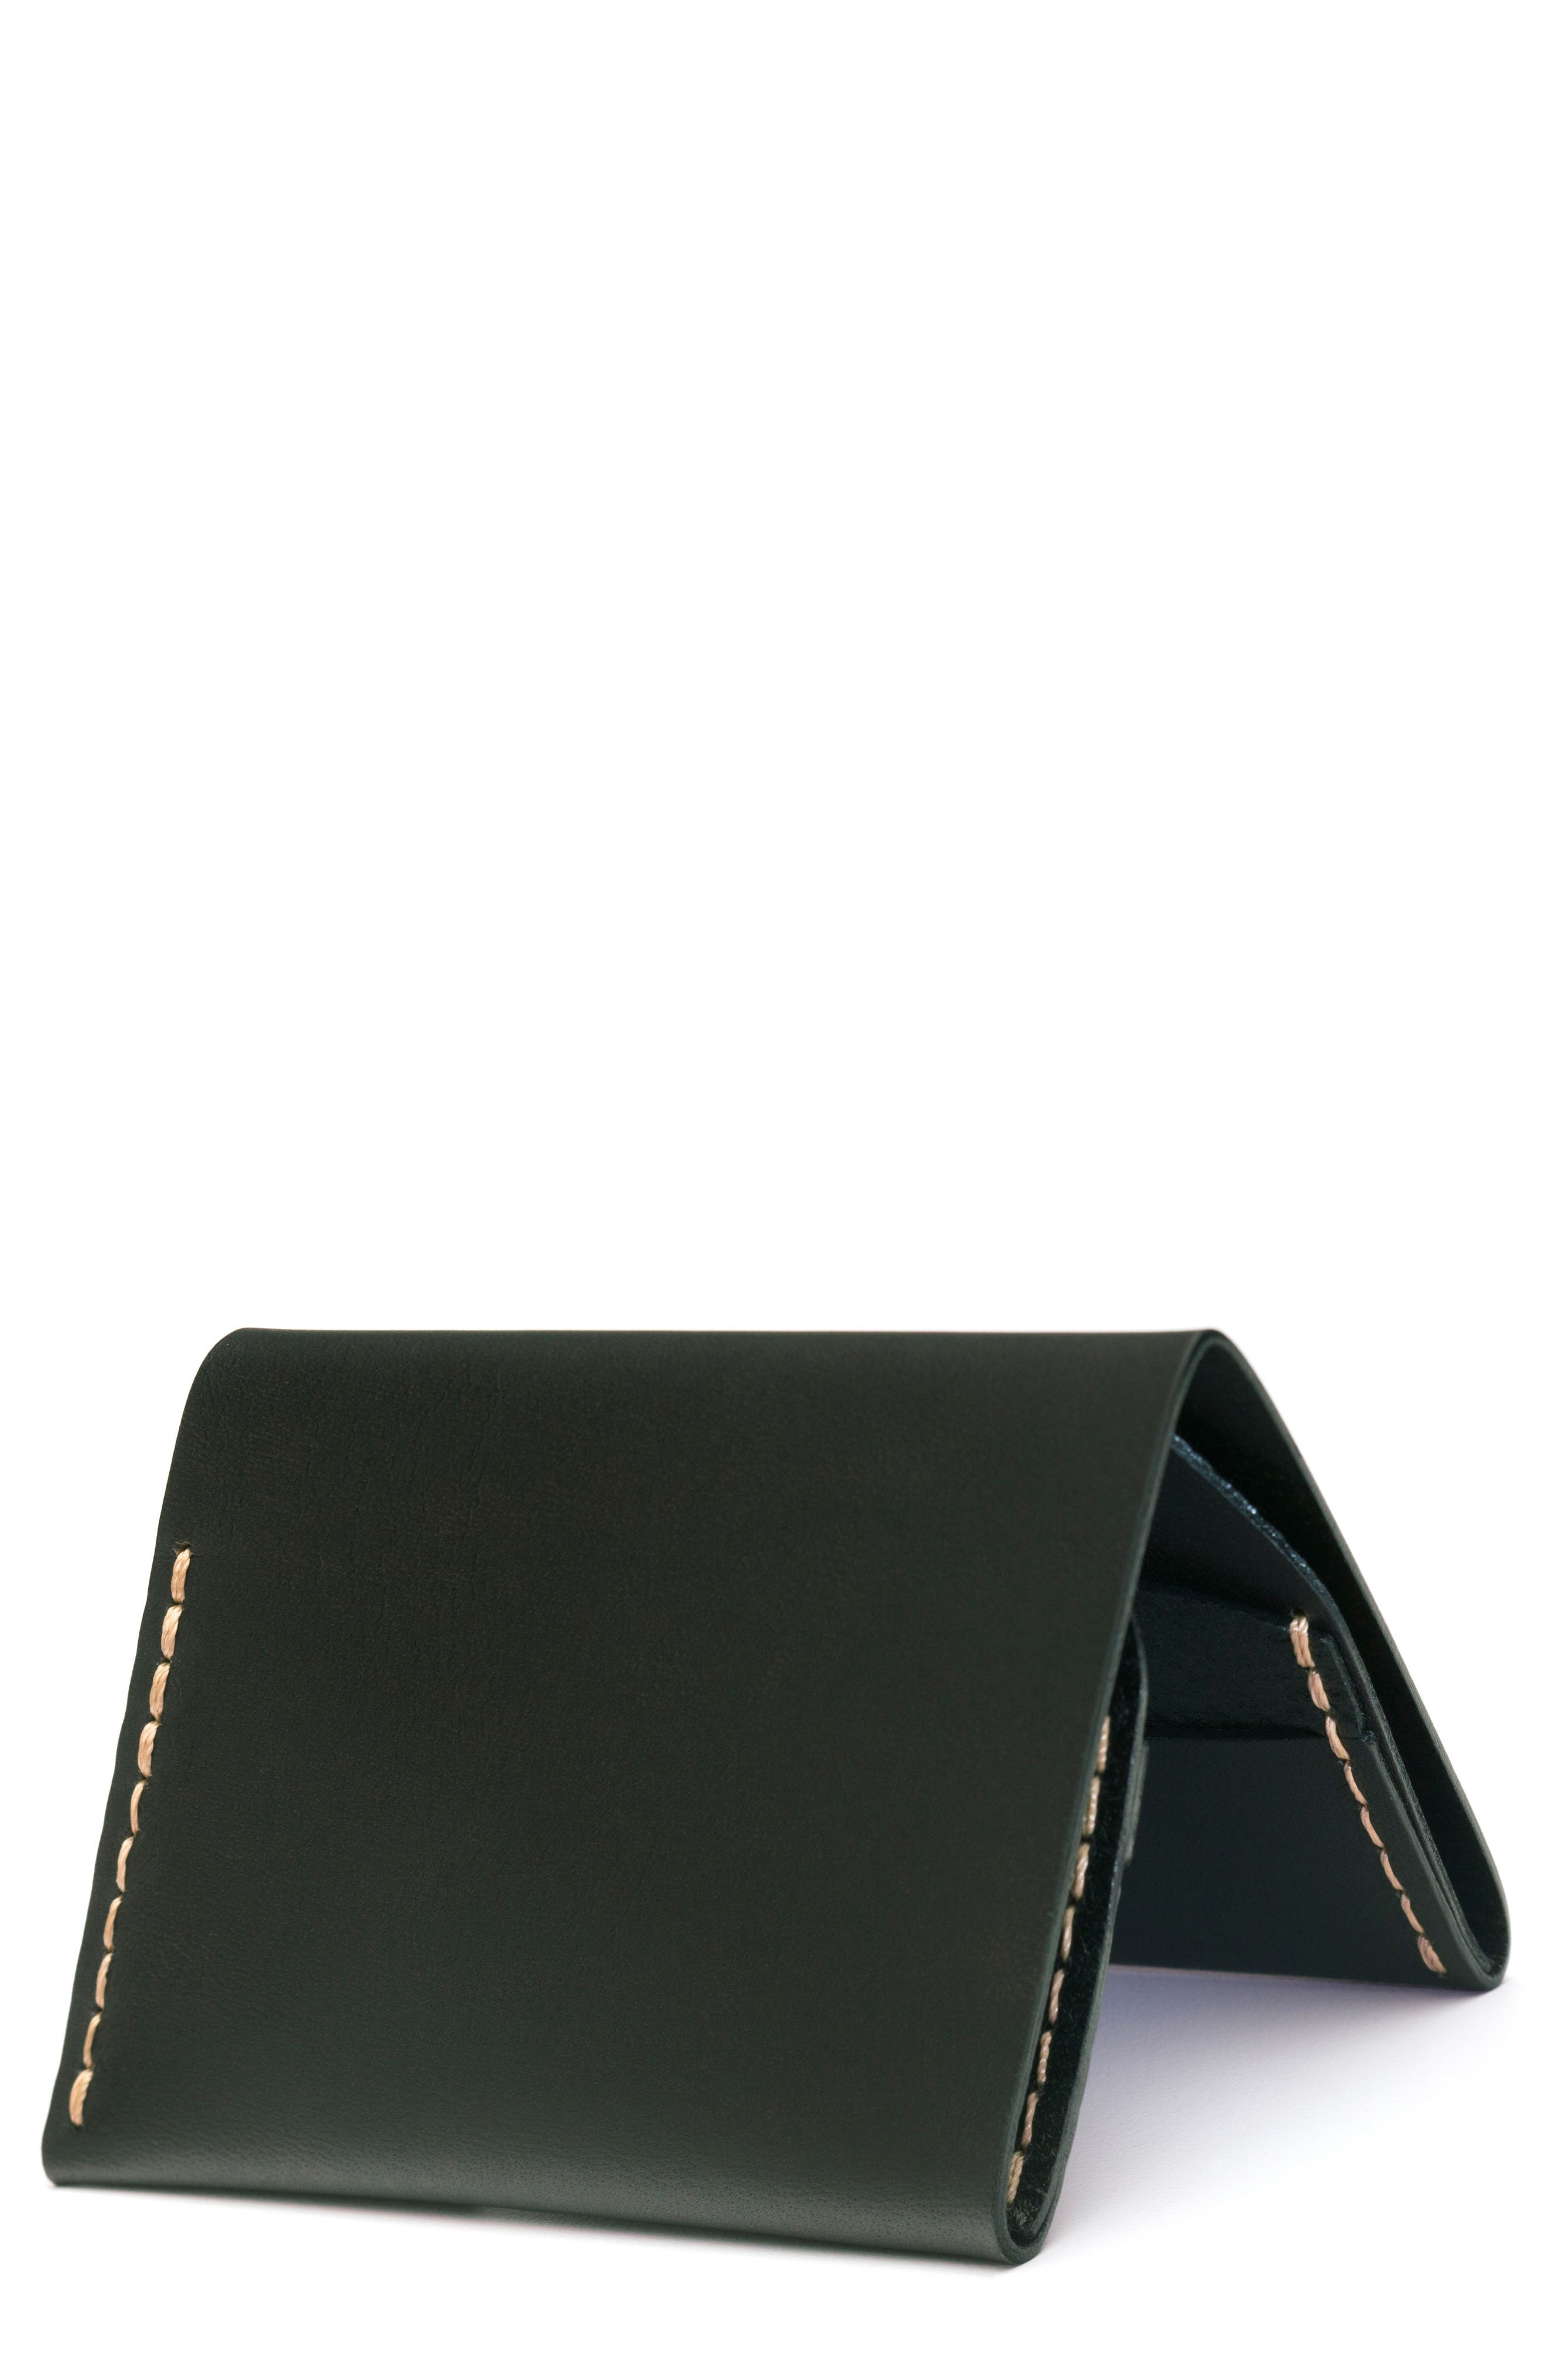 Ezra Arthur No. 4 Leather Wallet